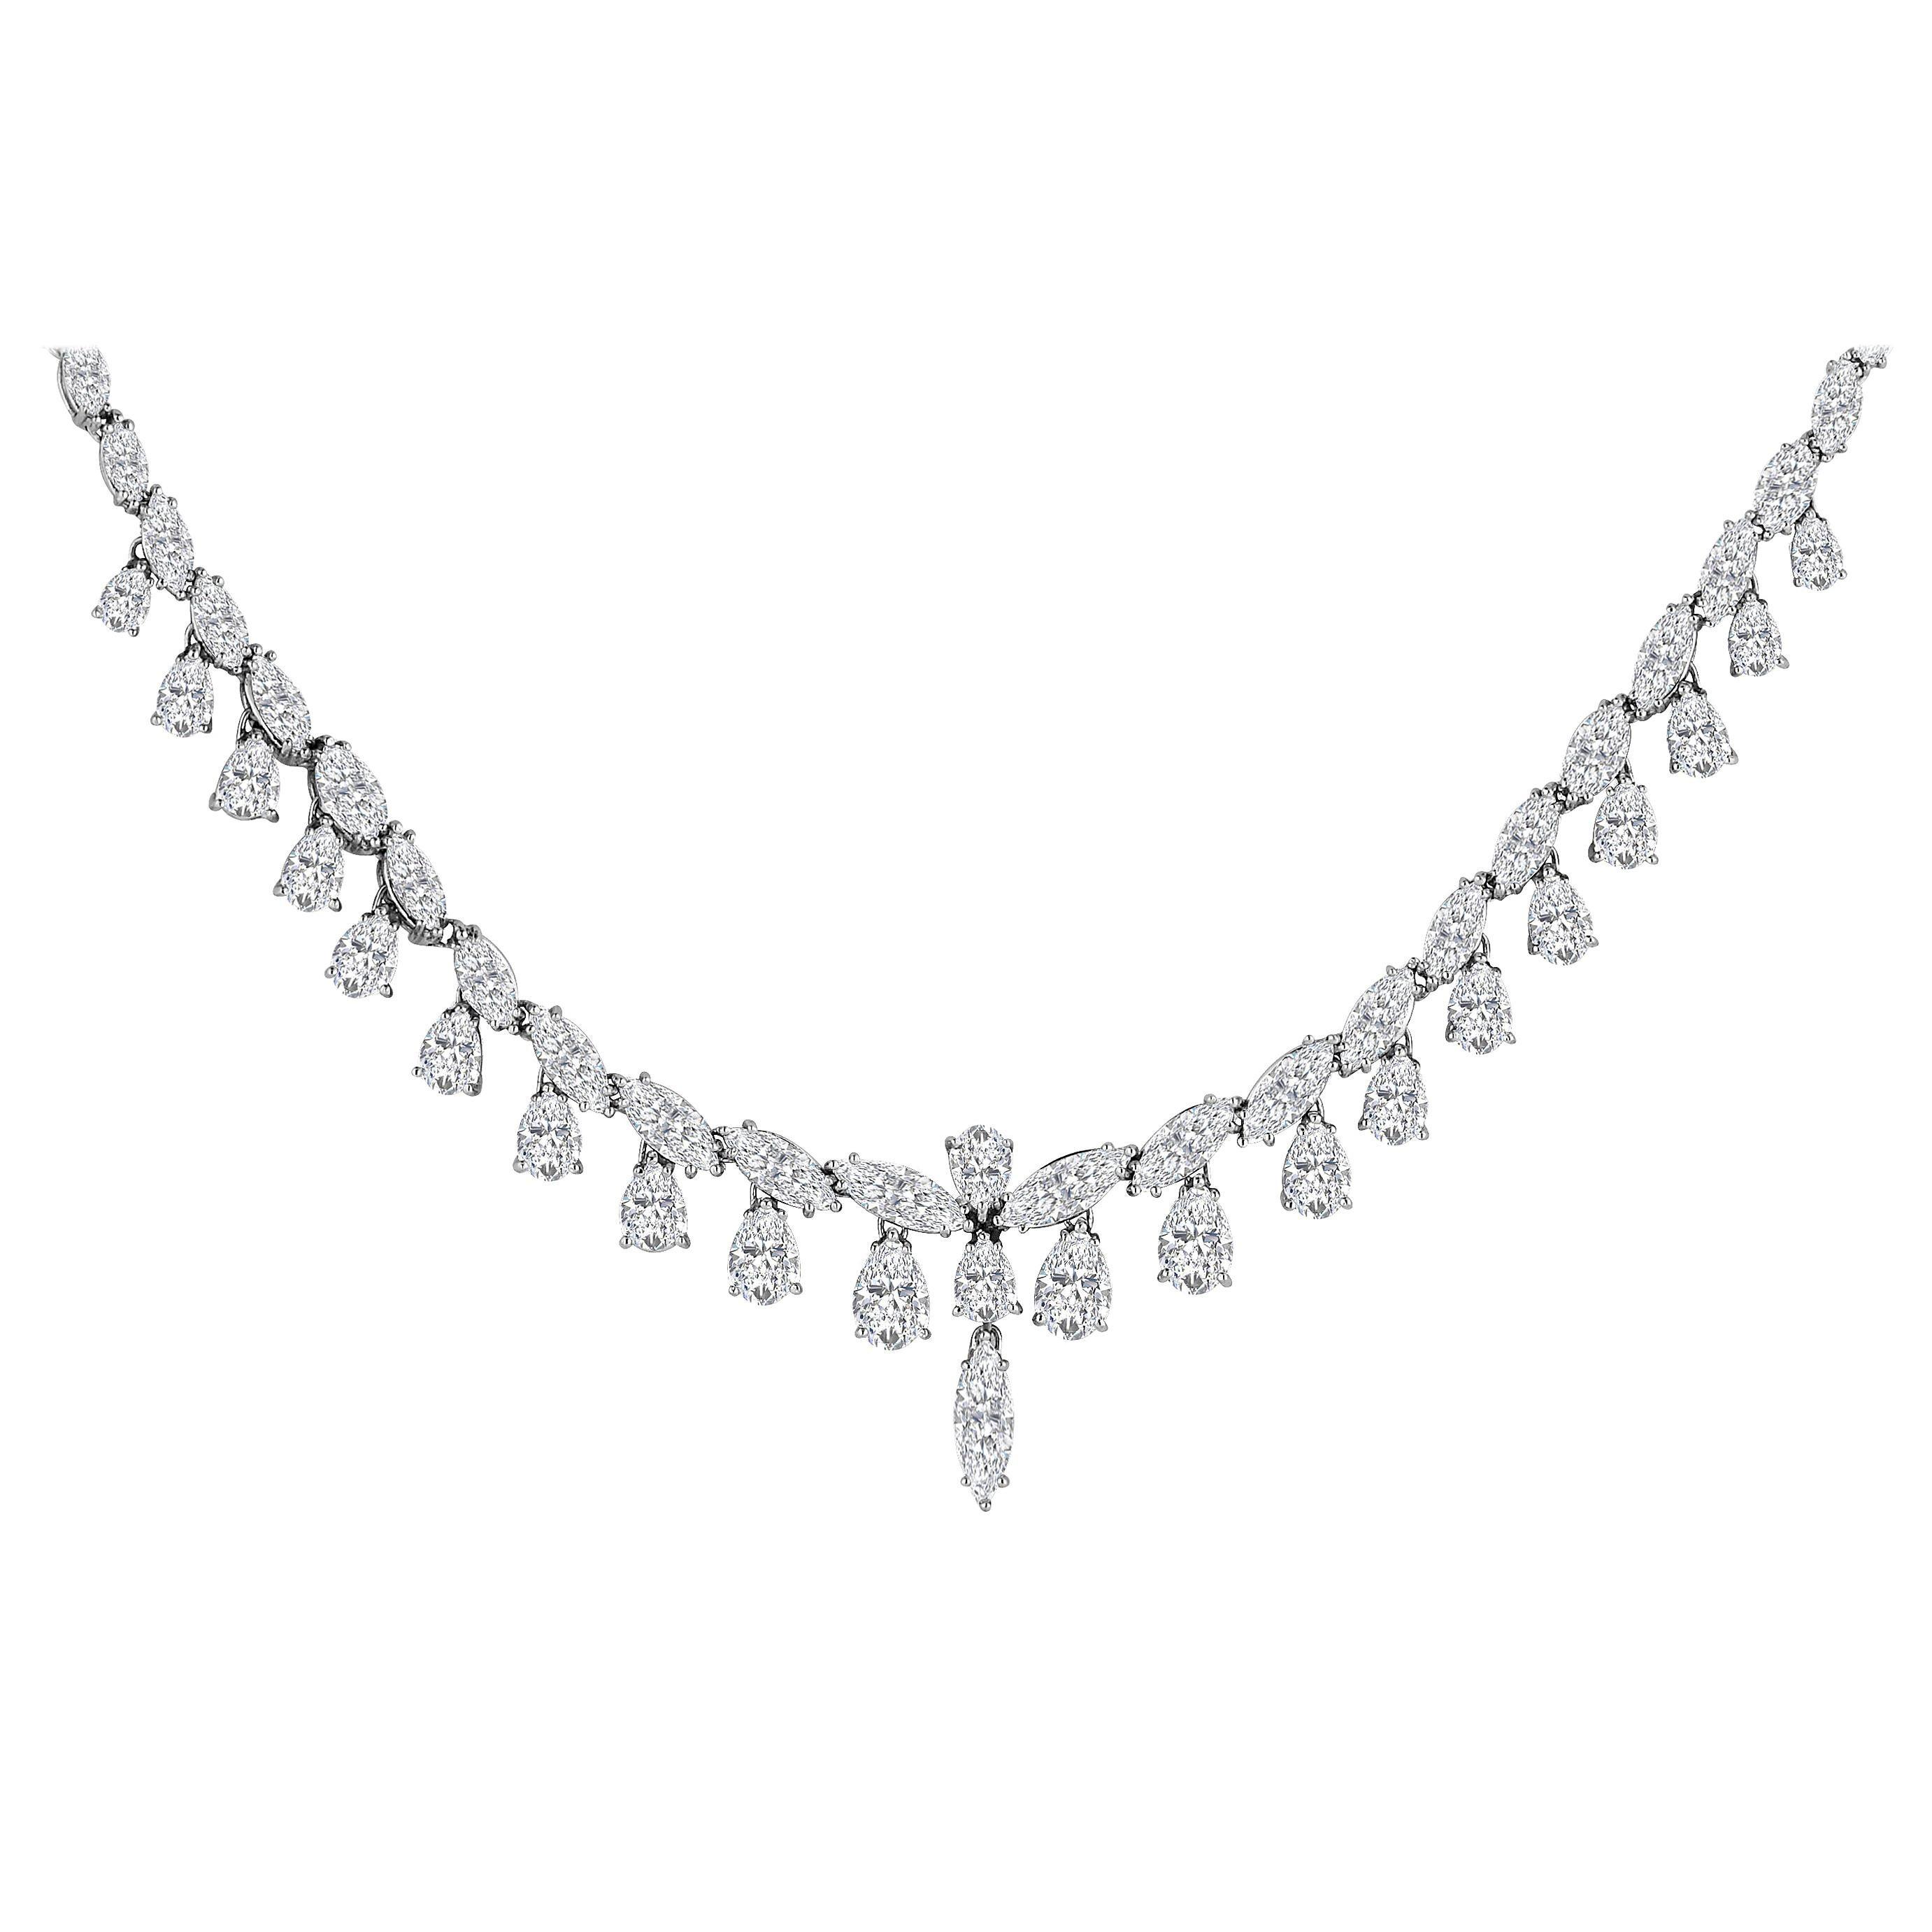 Emilio Jewelry 26.75 Carat Marquise Pear Shape Diamond Necklace